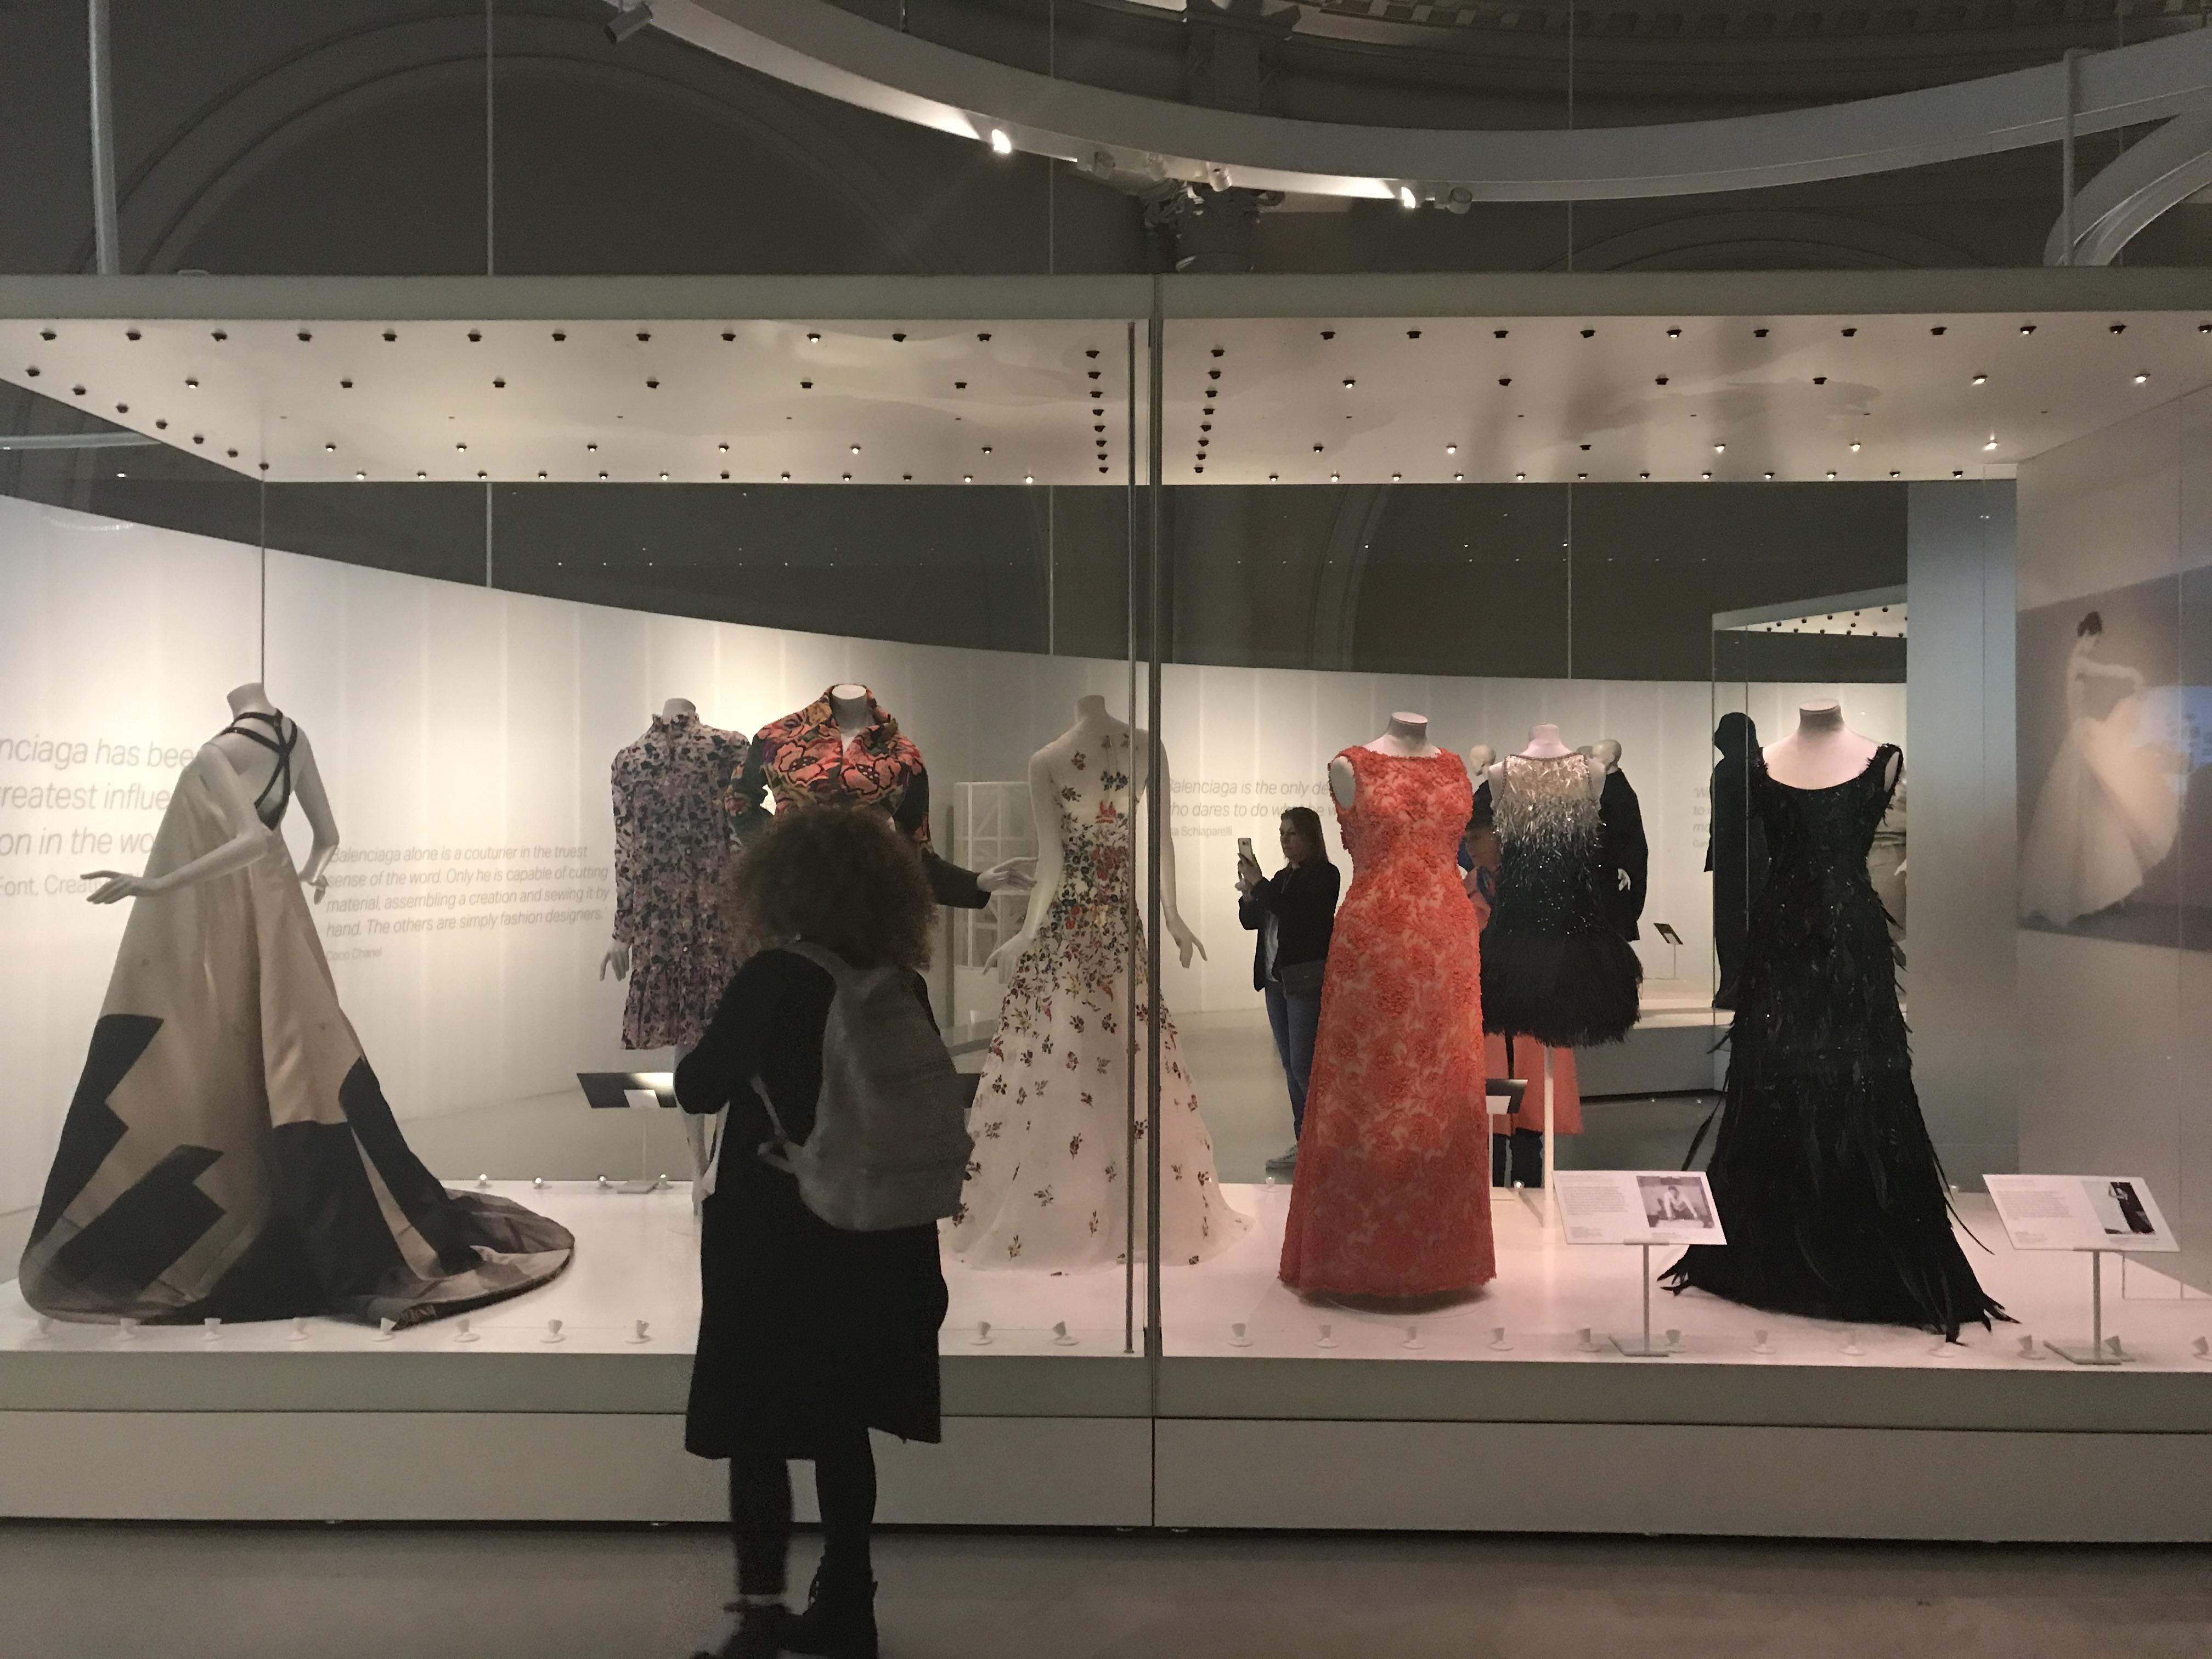 A day in London Life: A look at the Balenciaga Exhibit